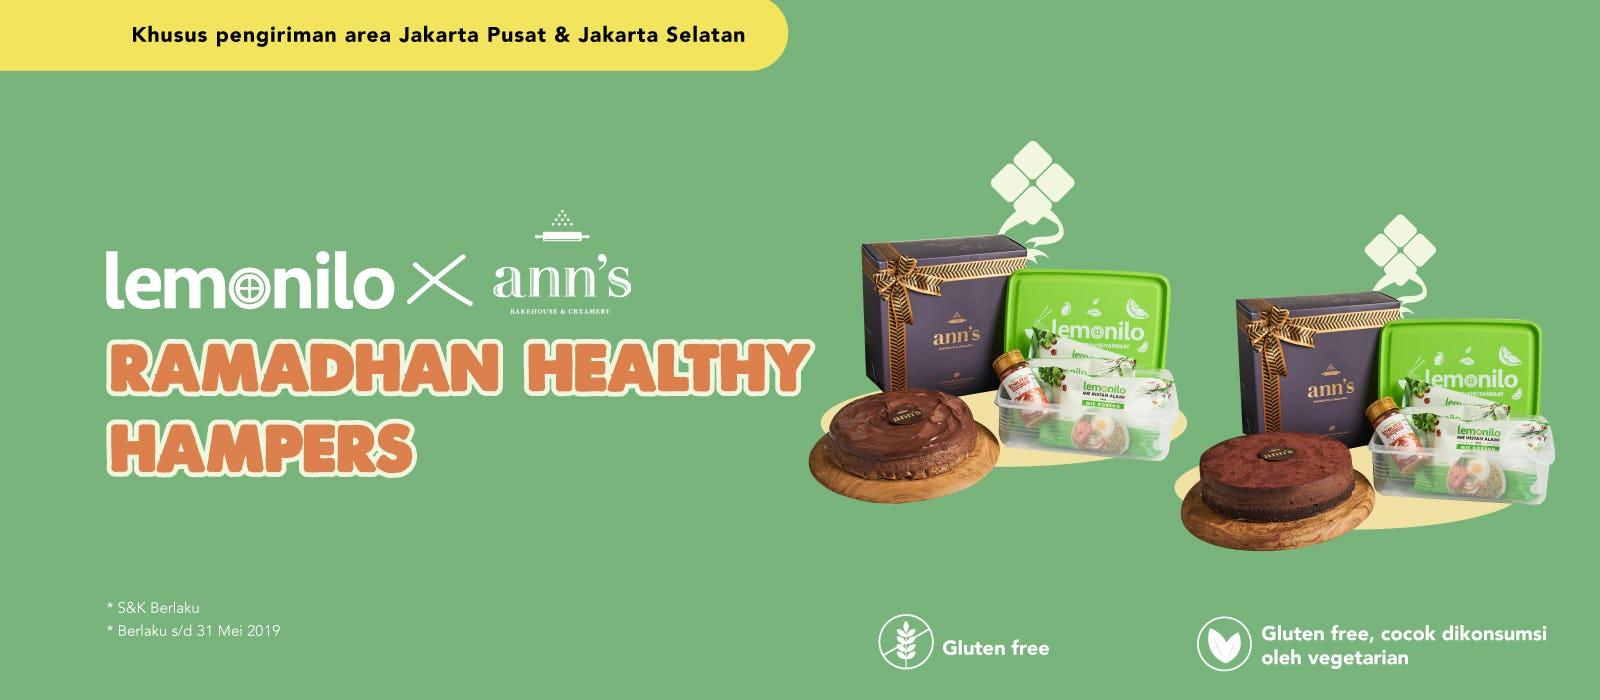 Lemonilo x Ann's Bakehouse & Creamery Ramadhan Healthy Hampers